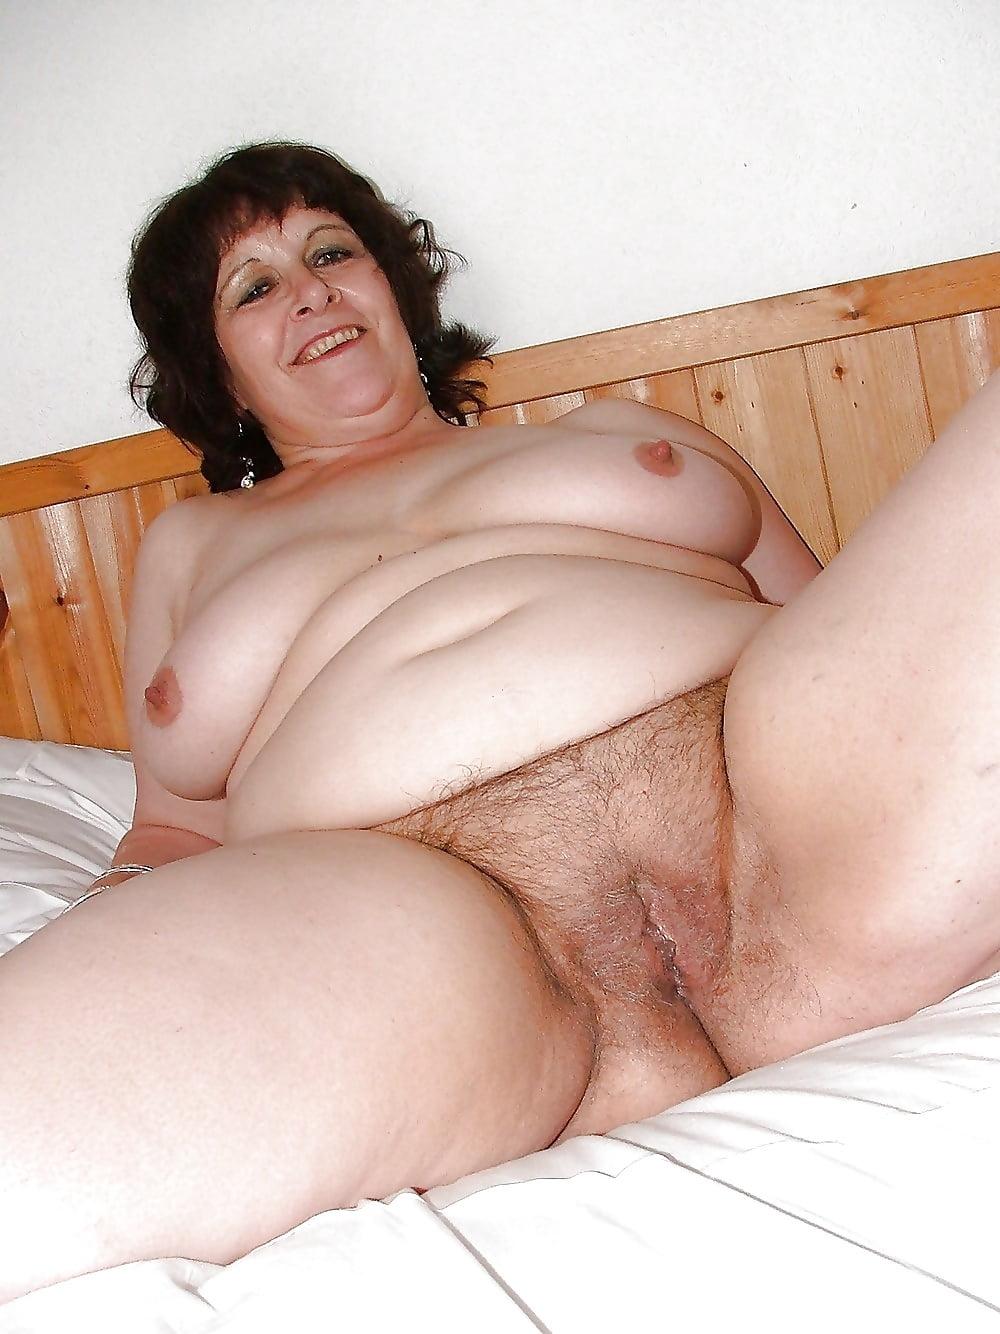 Chubby mature sex pics, women porn photos